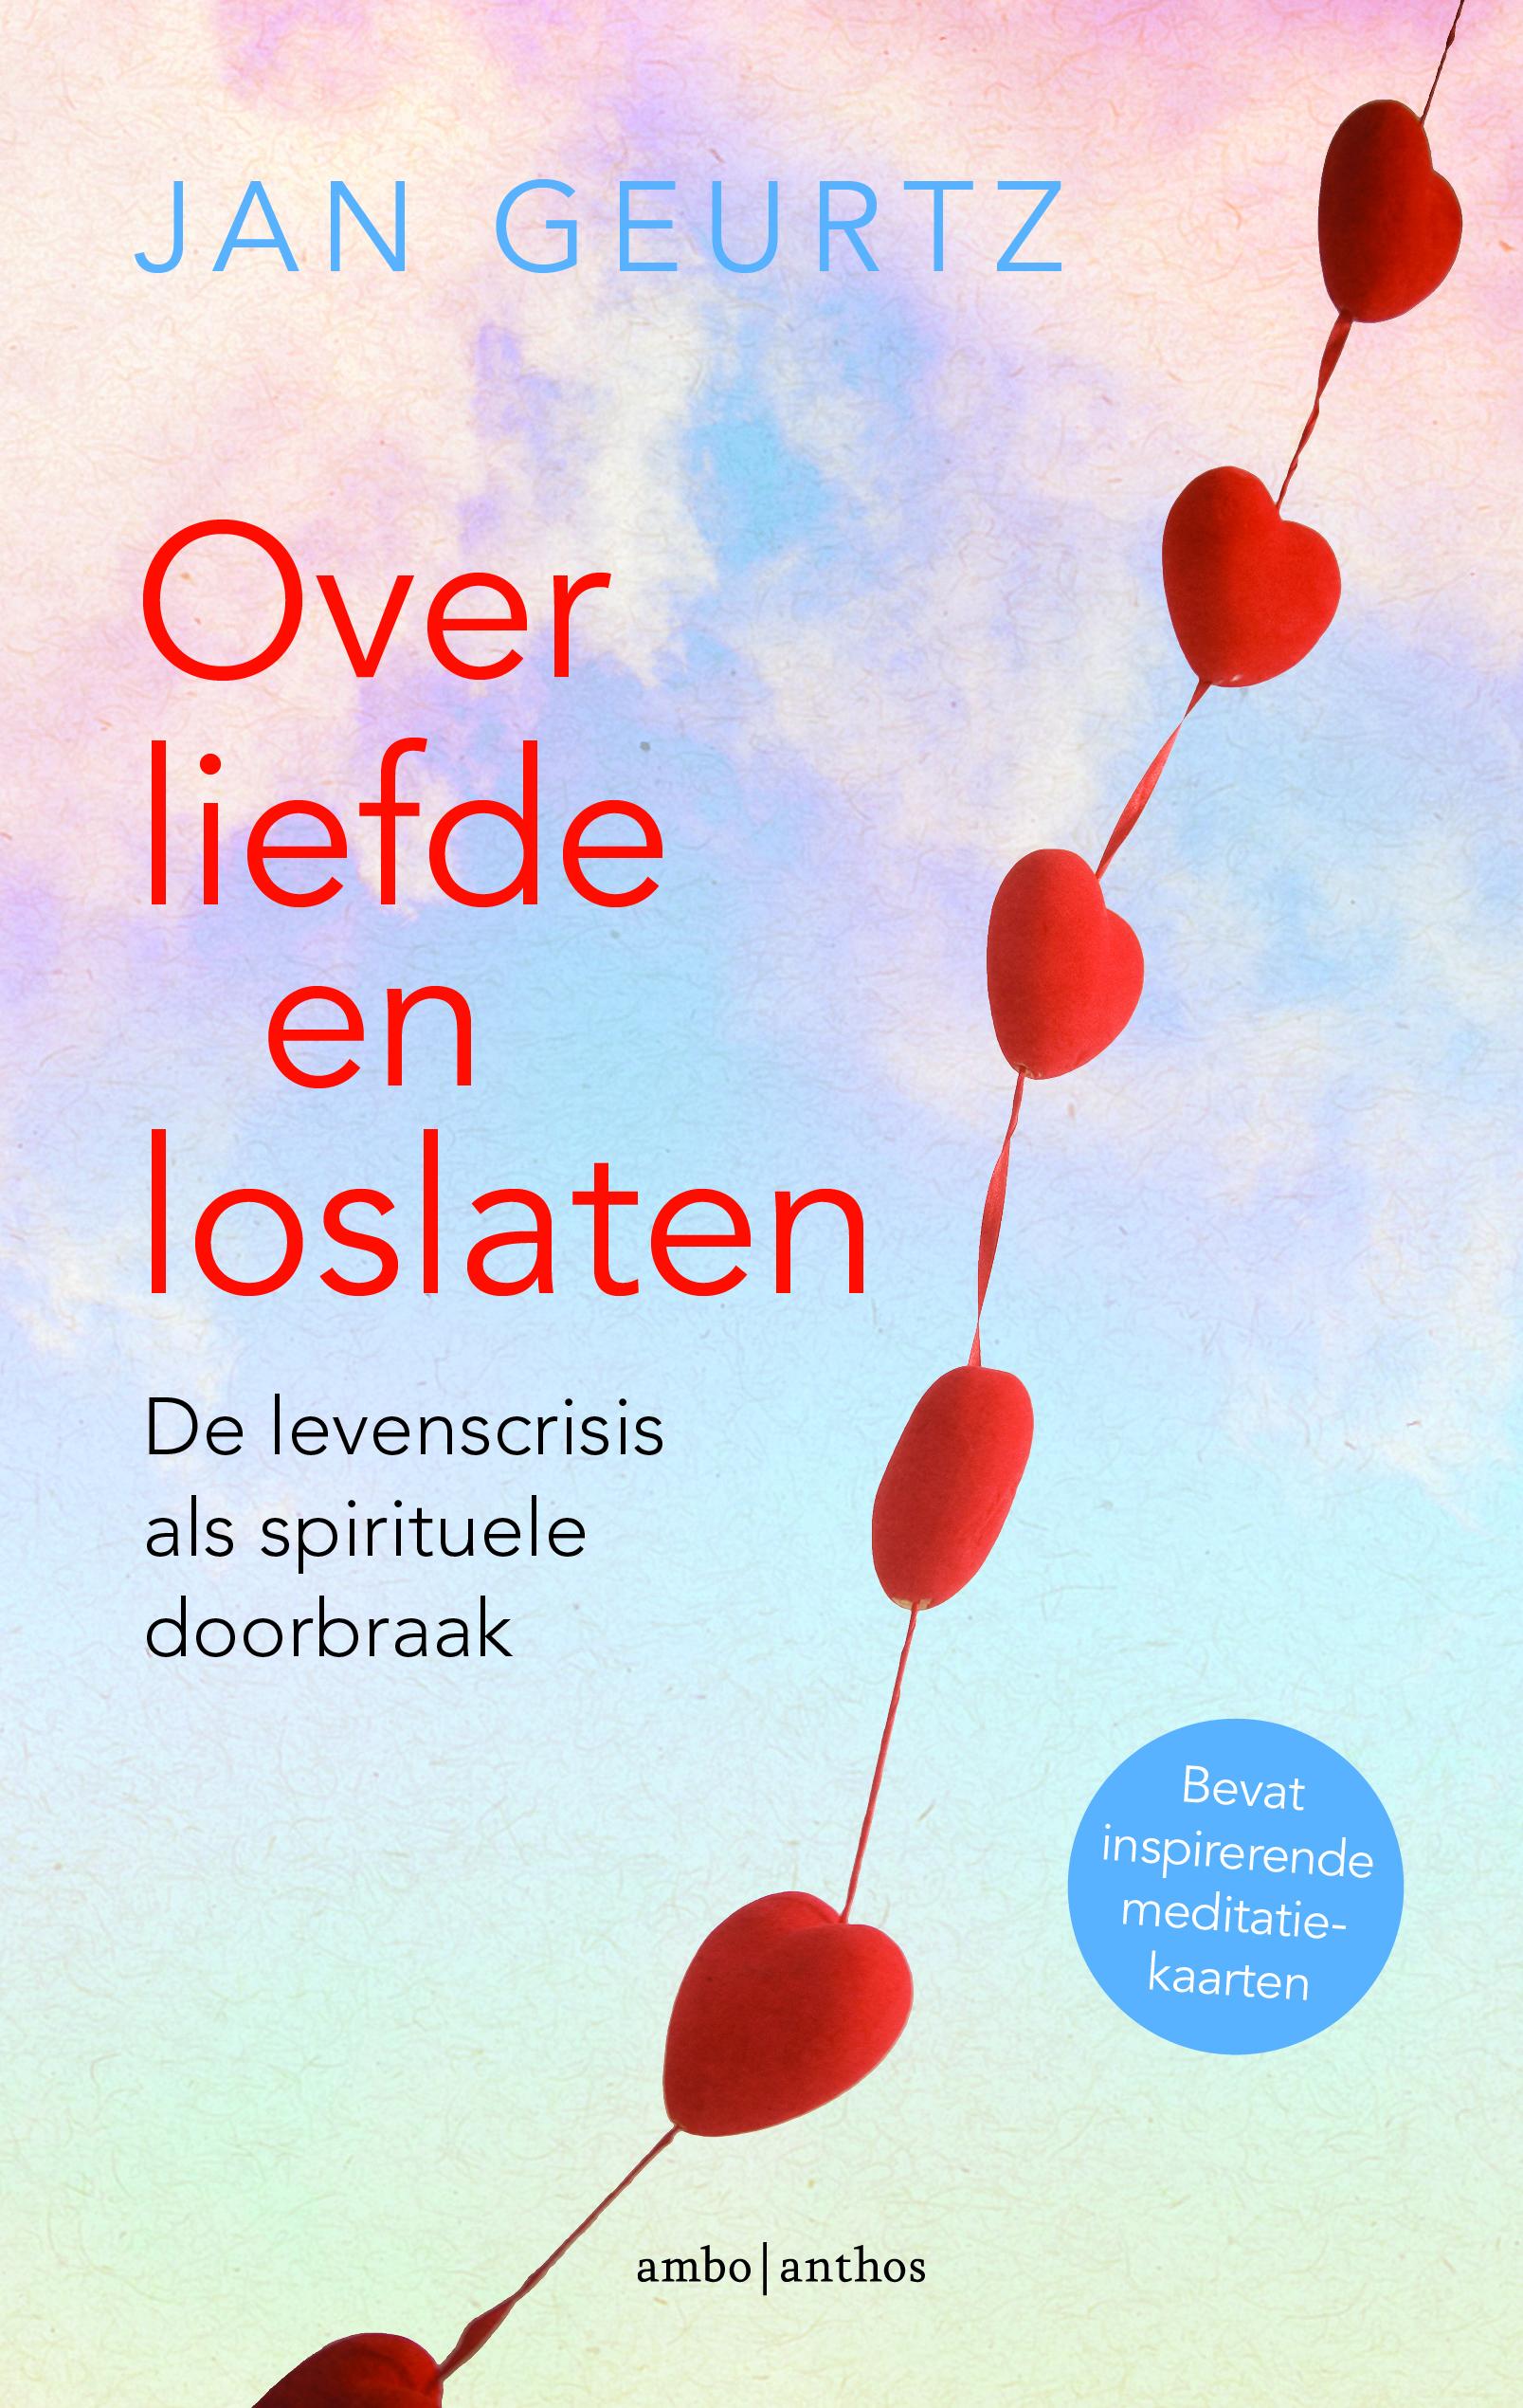 Favoriete Lees: Jan Geurtz over liefde en loslaten - Yogisan @PJ78